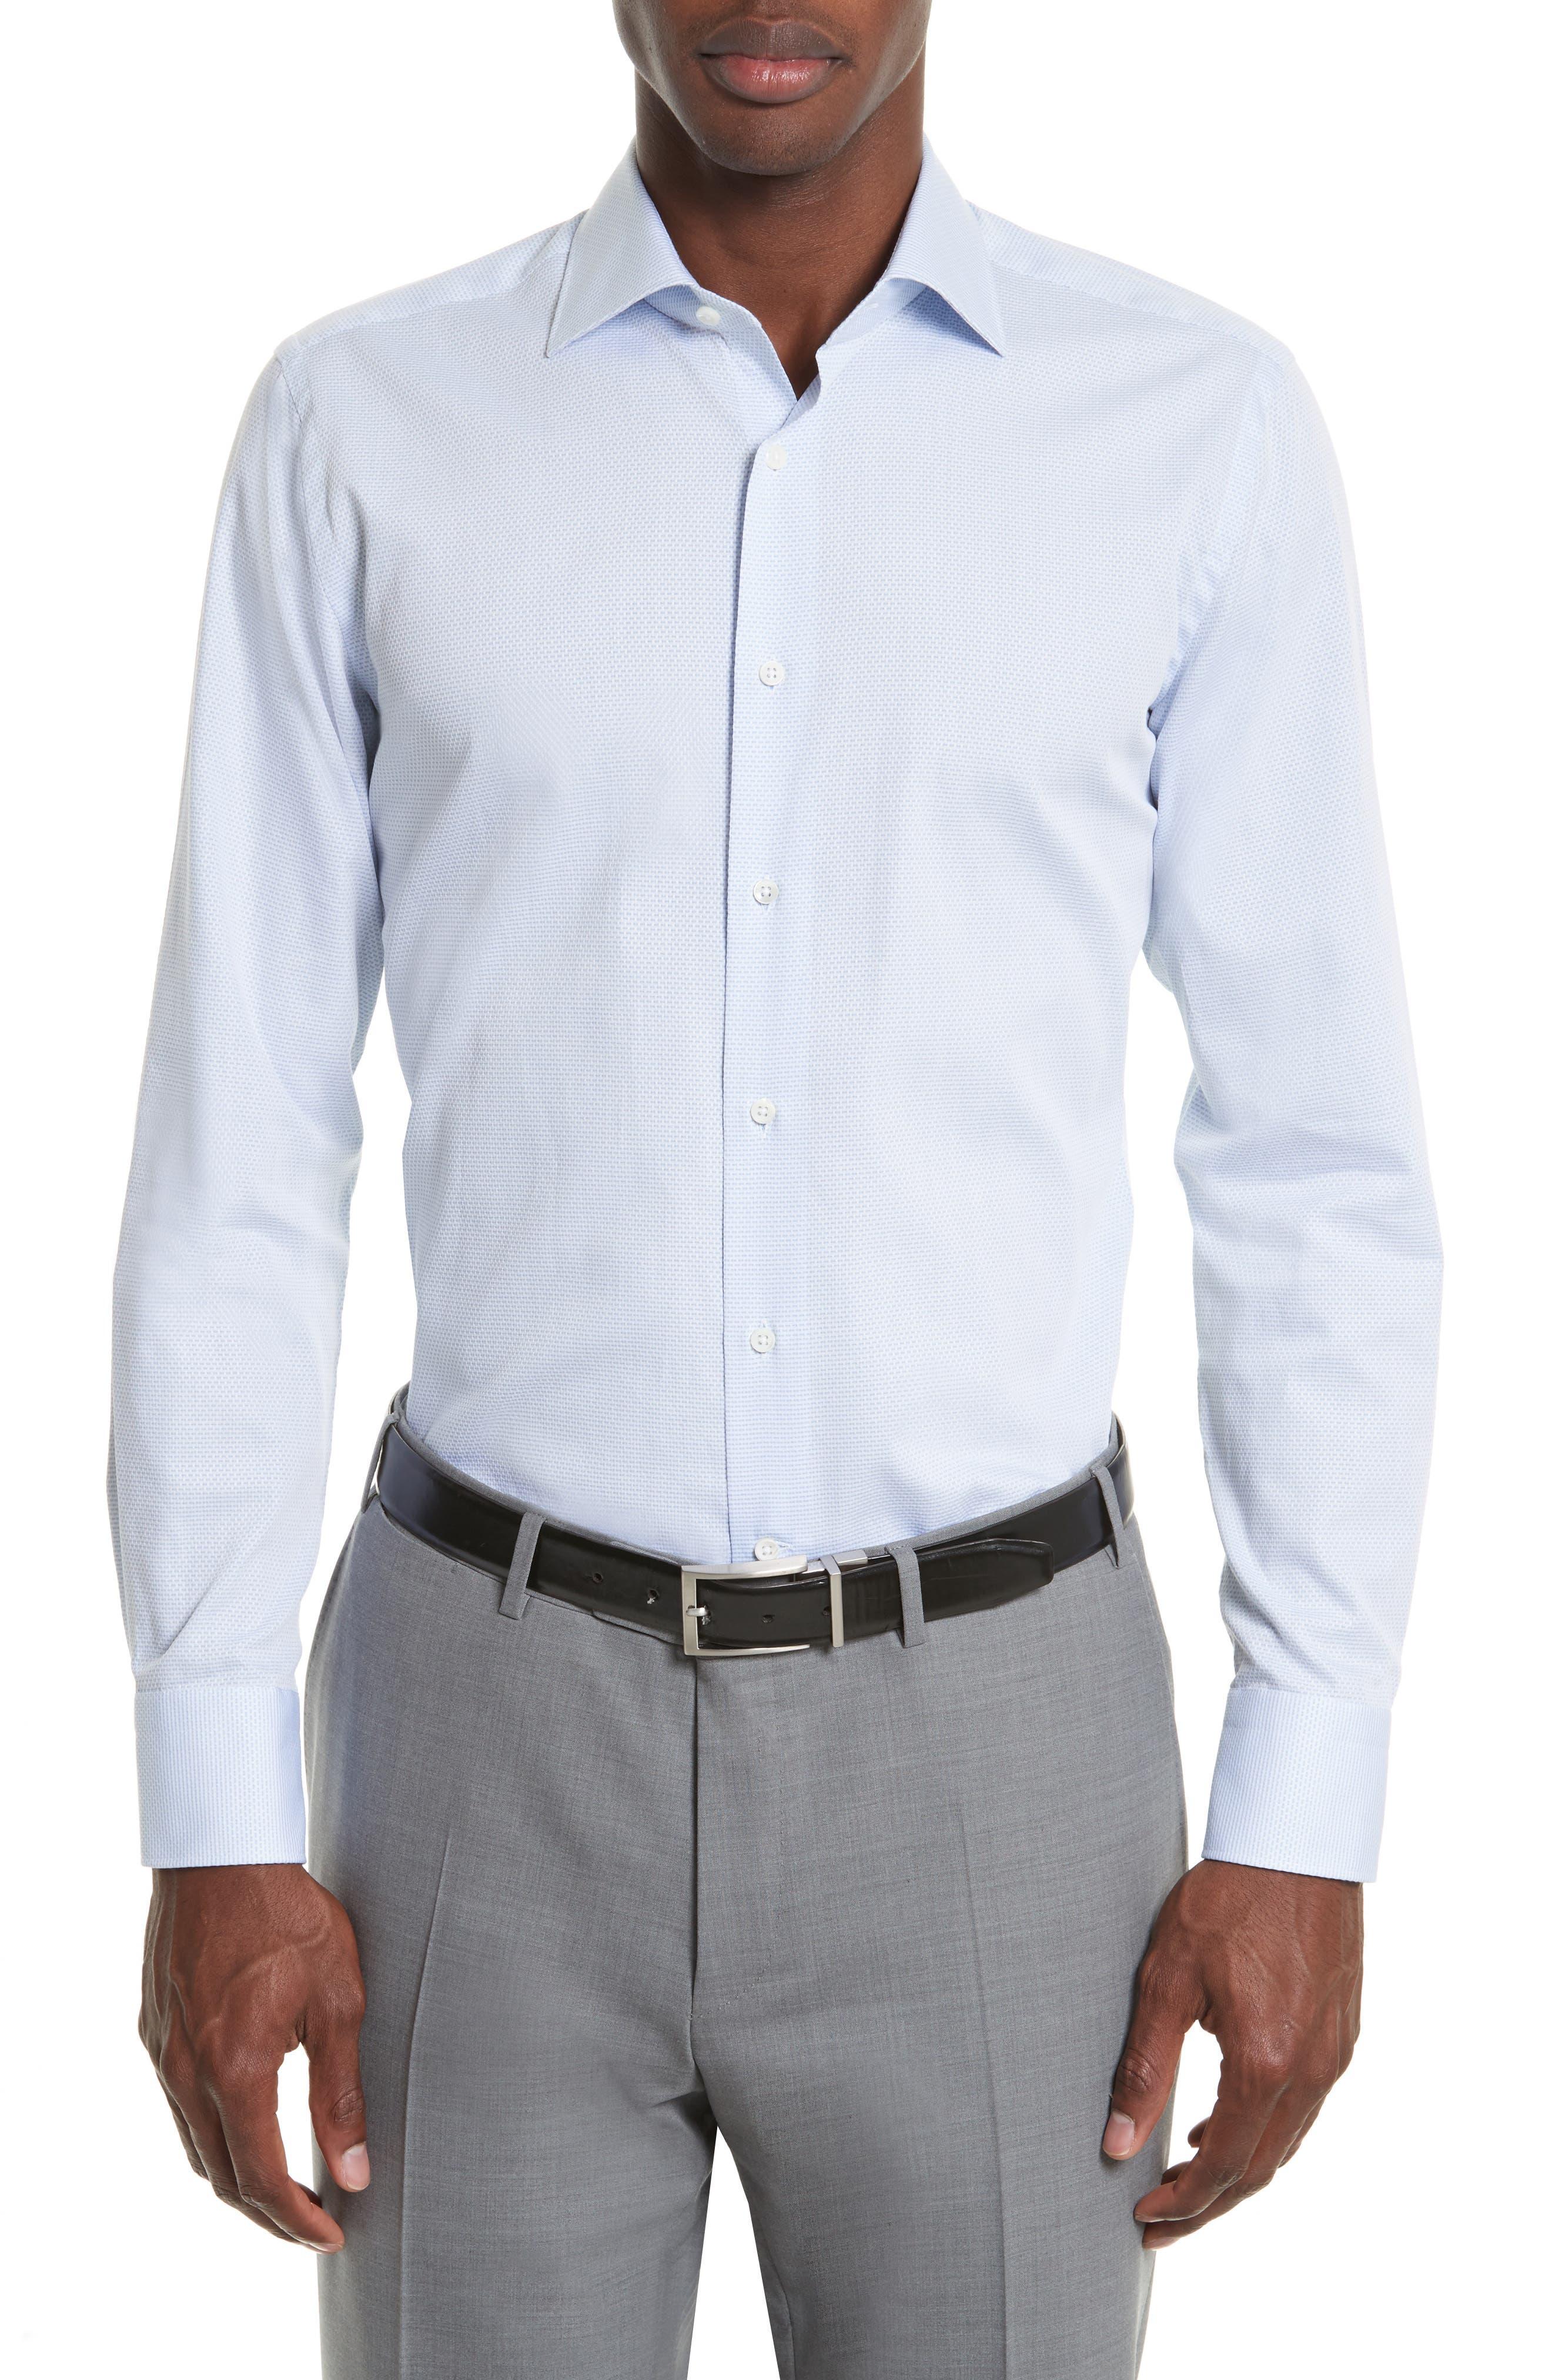 Regular Fit Solid Dress Shirt,                             Alternate thumbnail 2, color,                             Light Blue